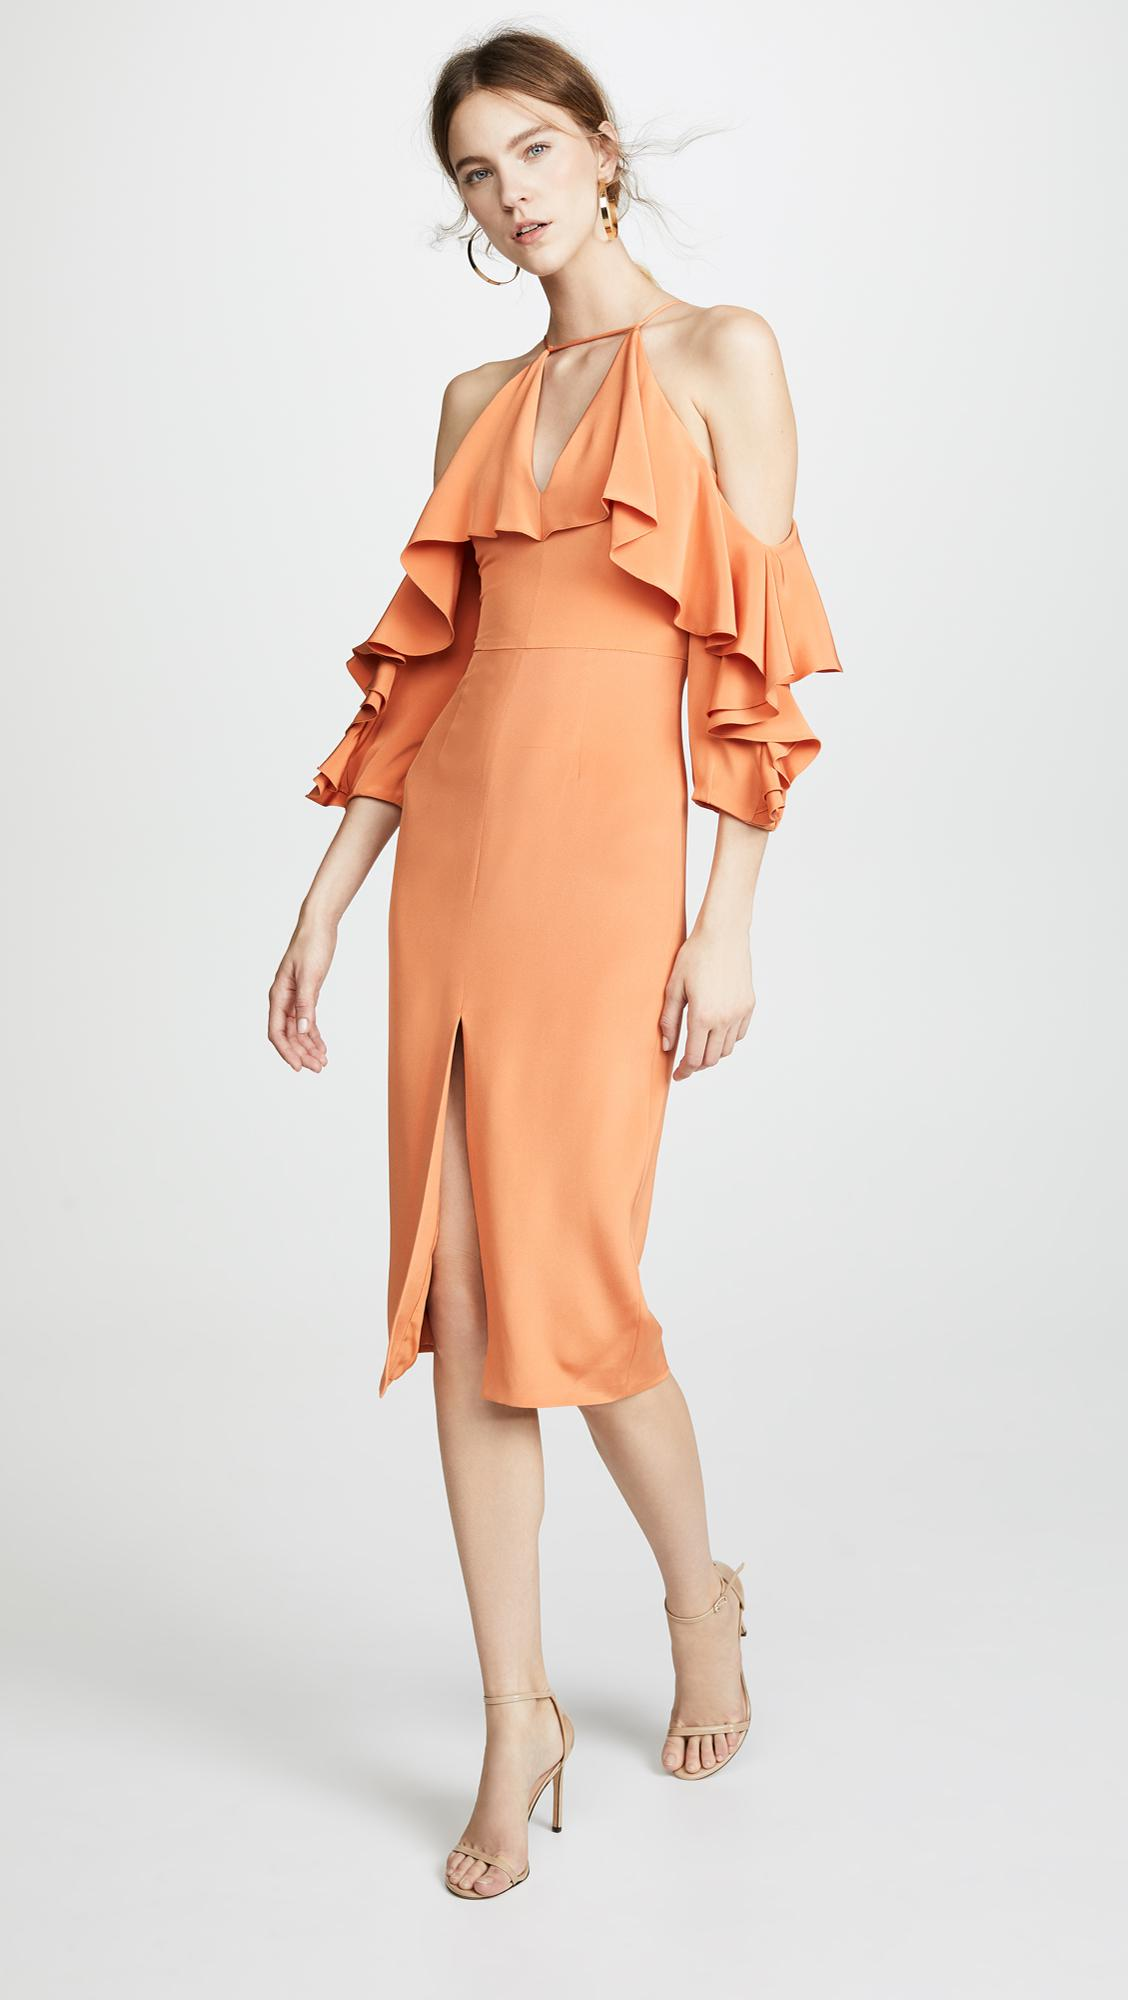 5f66a404f553 Cushnie et Ochs Aura Cold Shoulder Pencil Dress With Halter Neck in ...